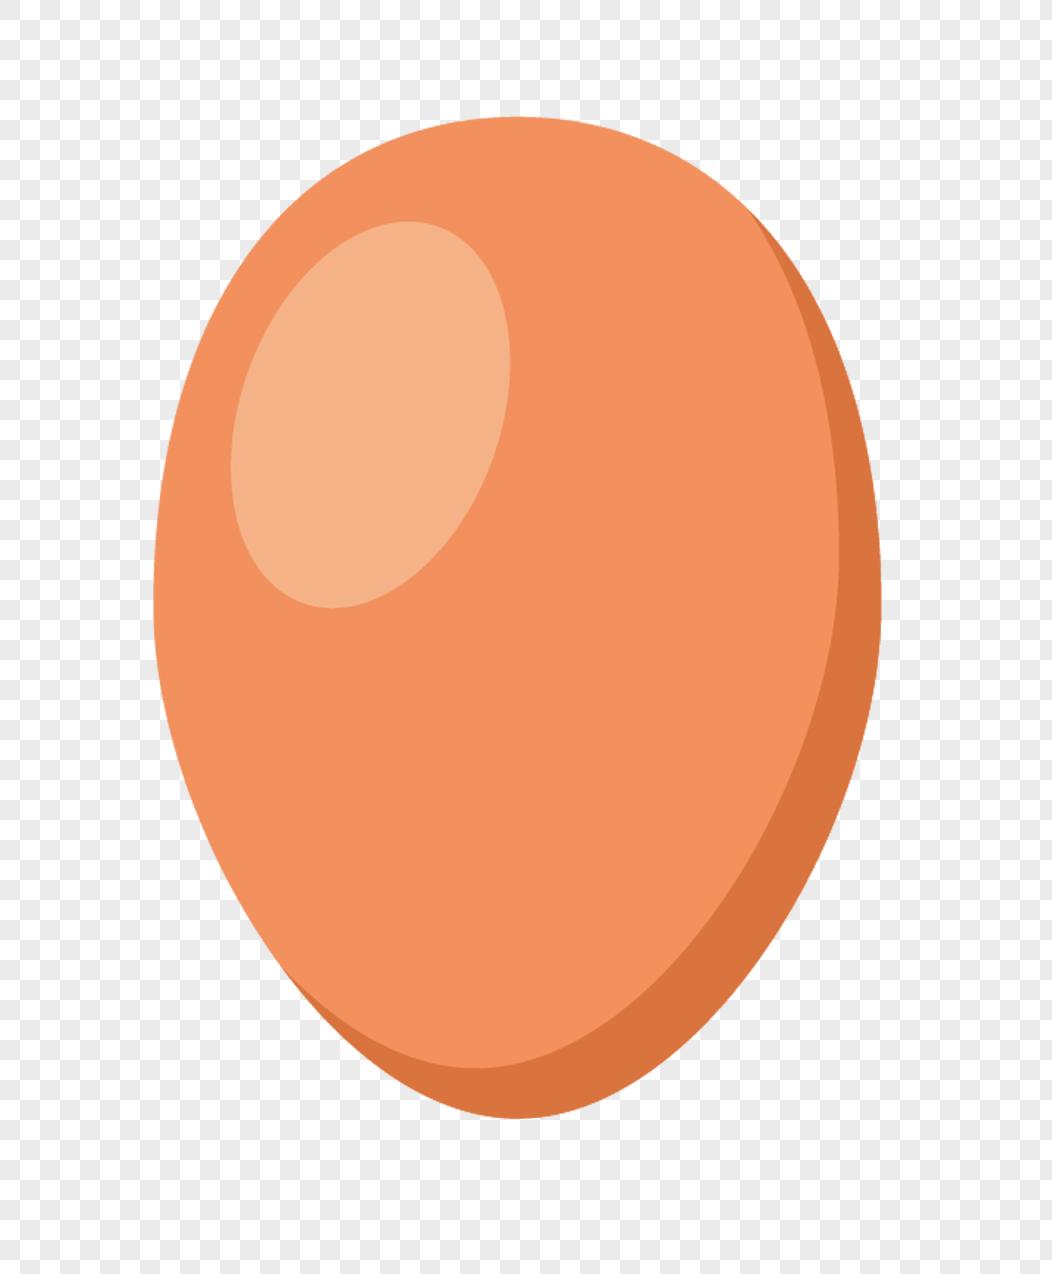 Kartun Telur Wwwtollebildcom